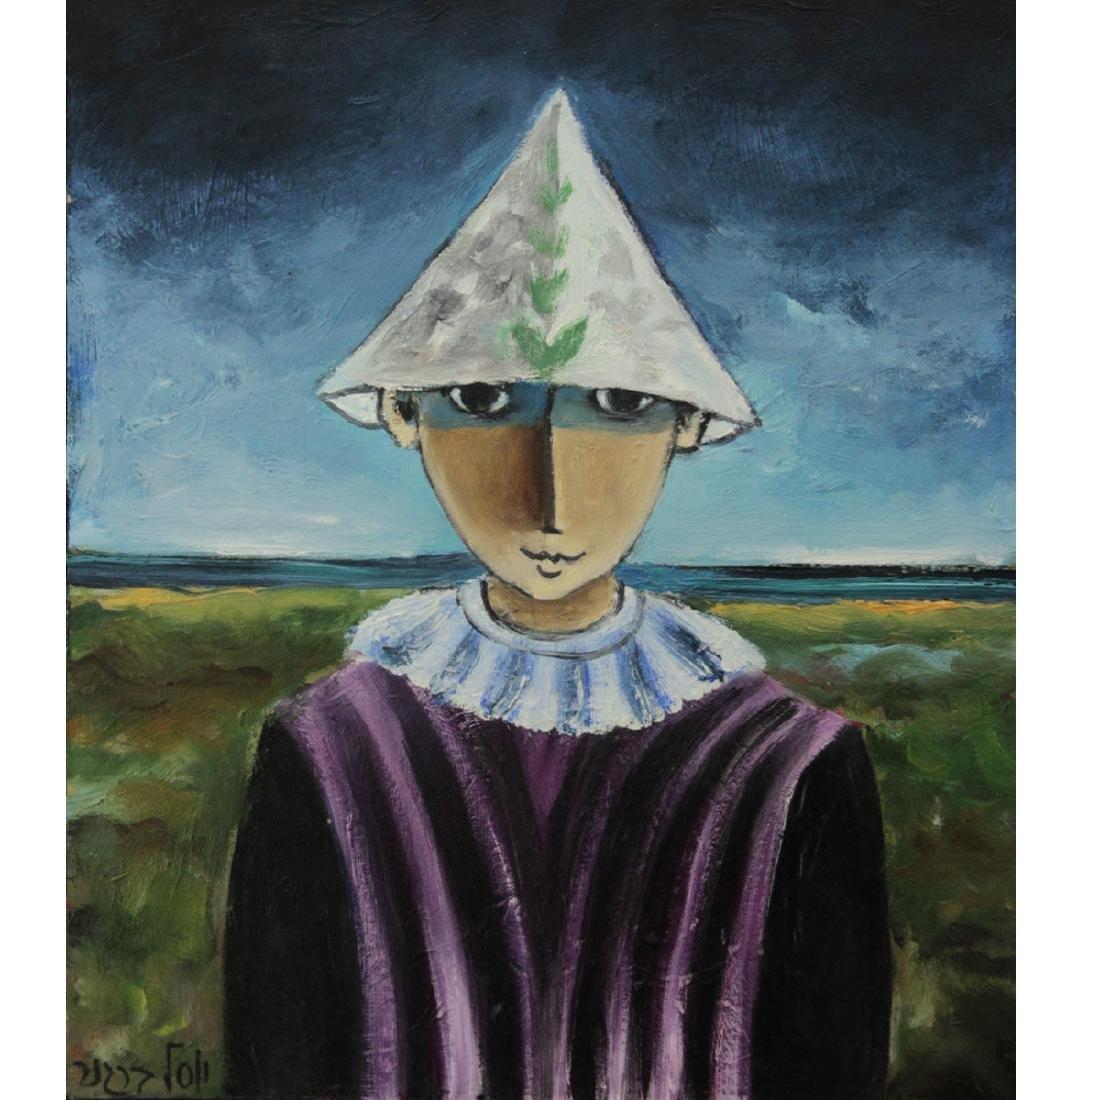 Yosl Bergner - Little Clown, Oil on Canvas.